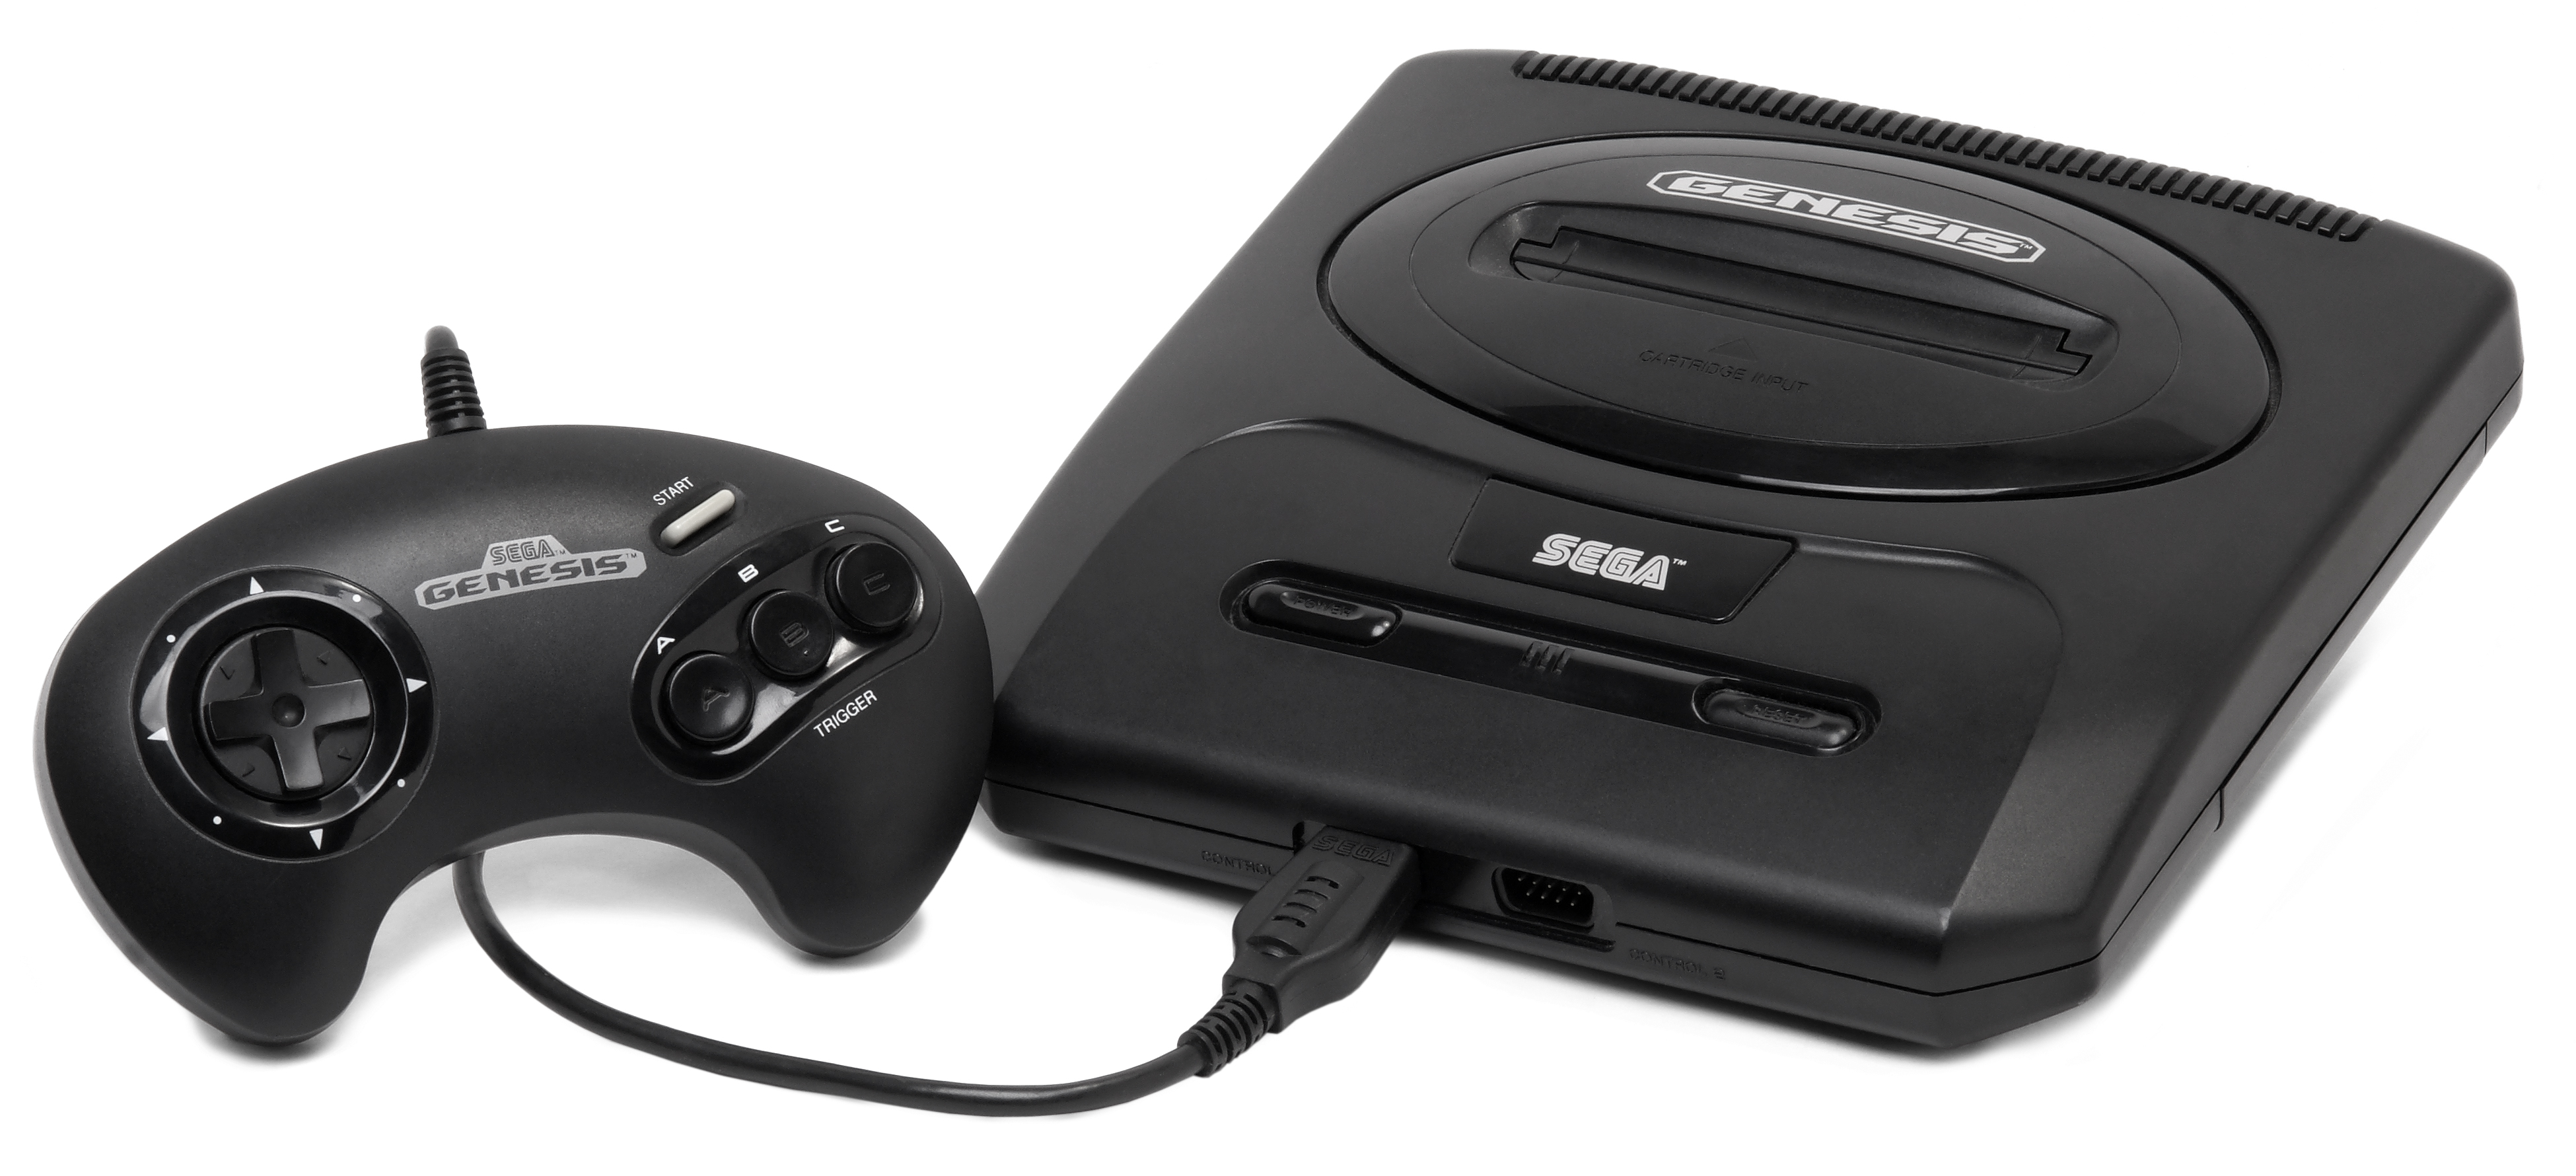 Sega-Genesis-Mod2-Set.jpg